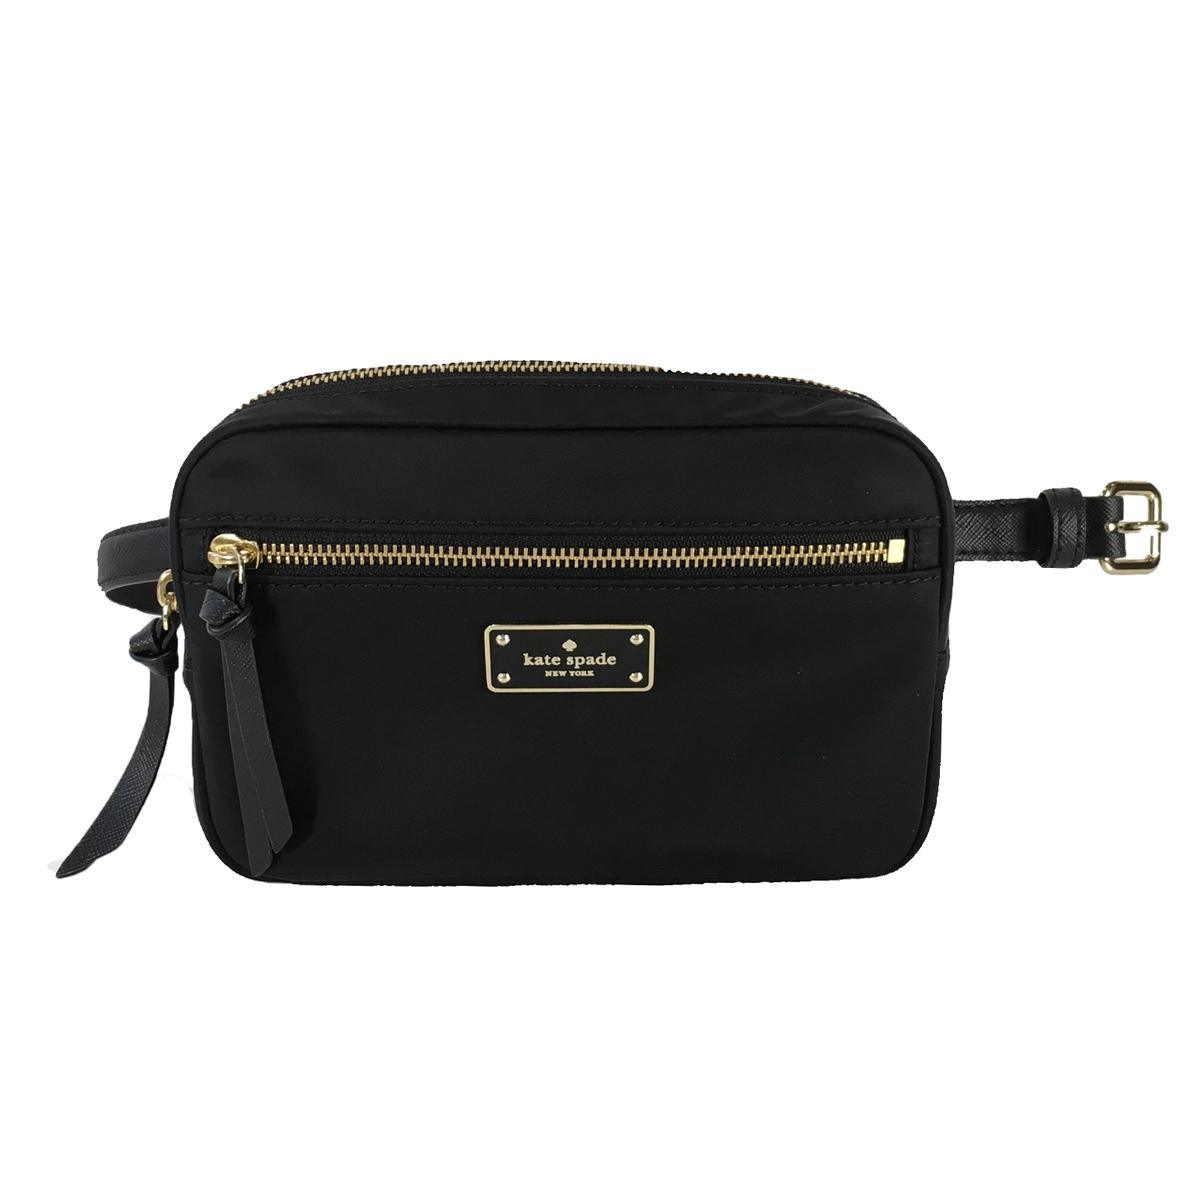 39de5b306f932 Kate Spade Sophy Nylon Waist Pack Belt Bag, Black